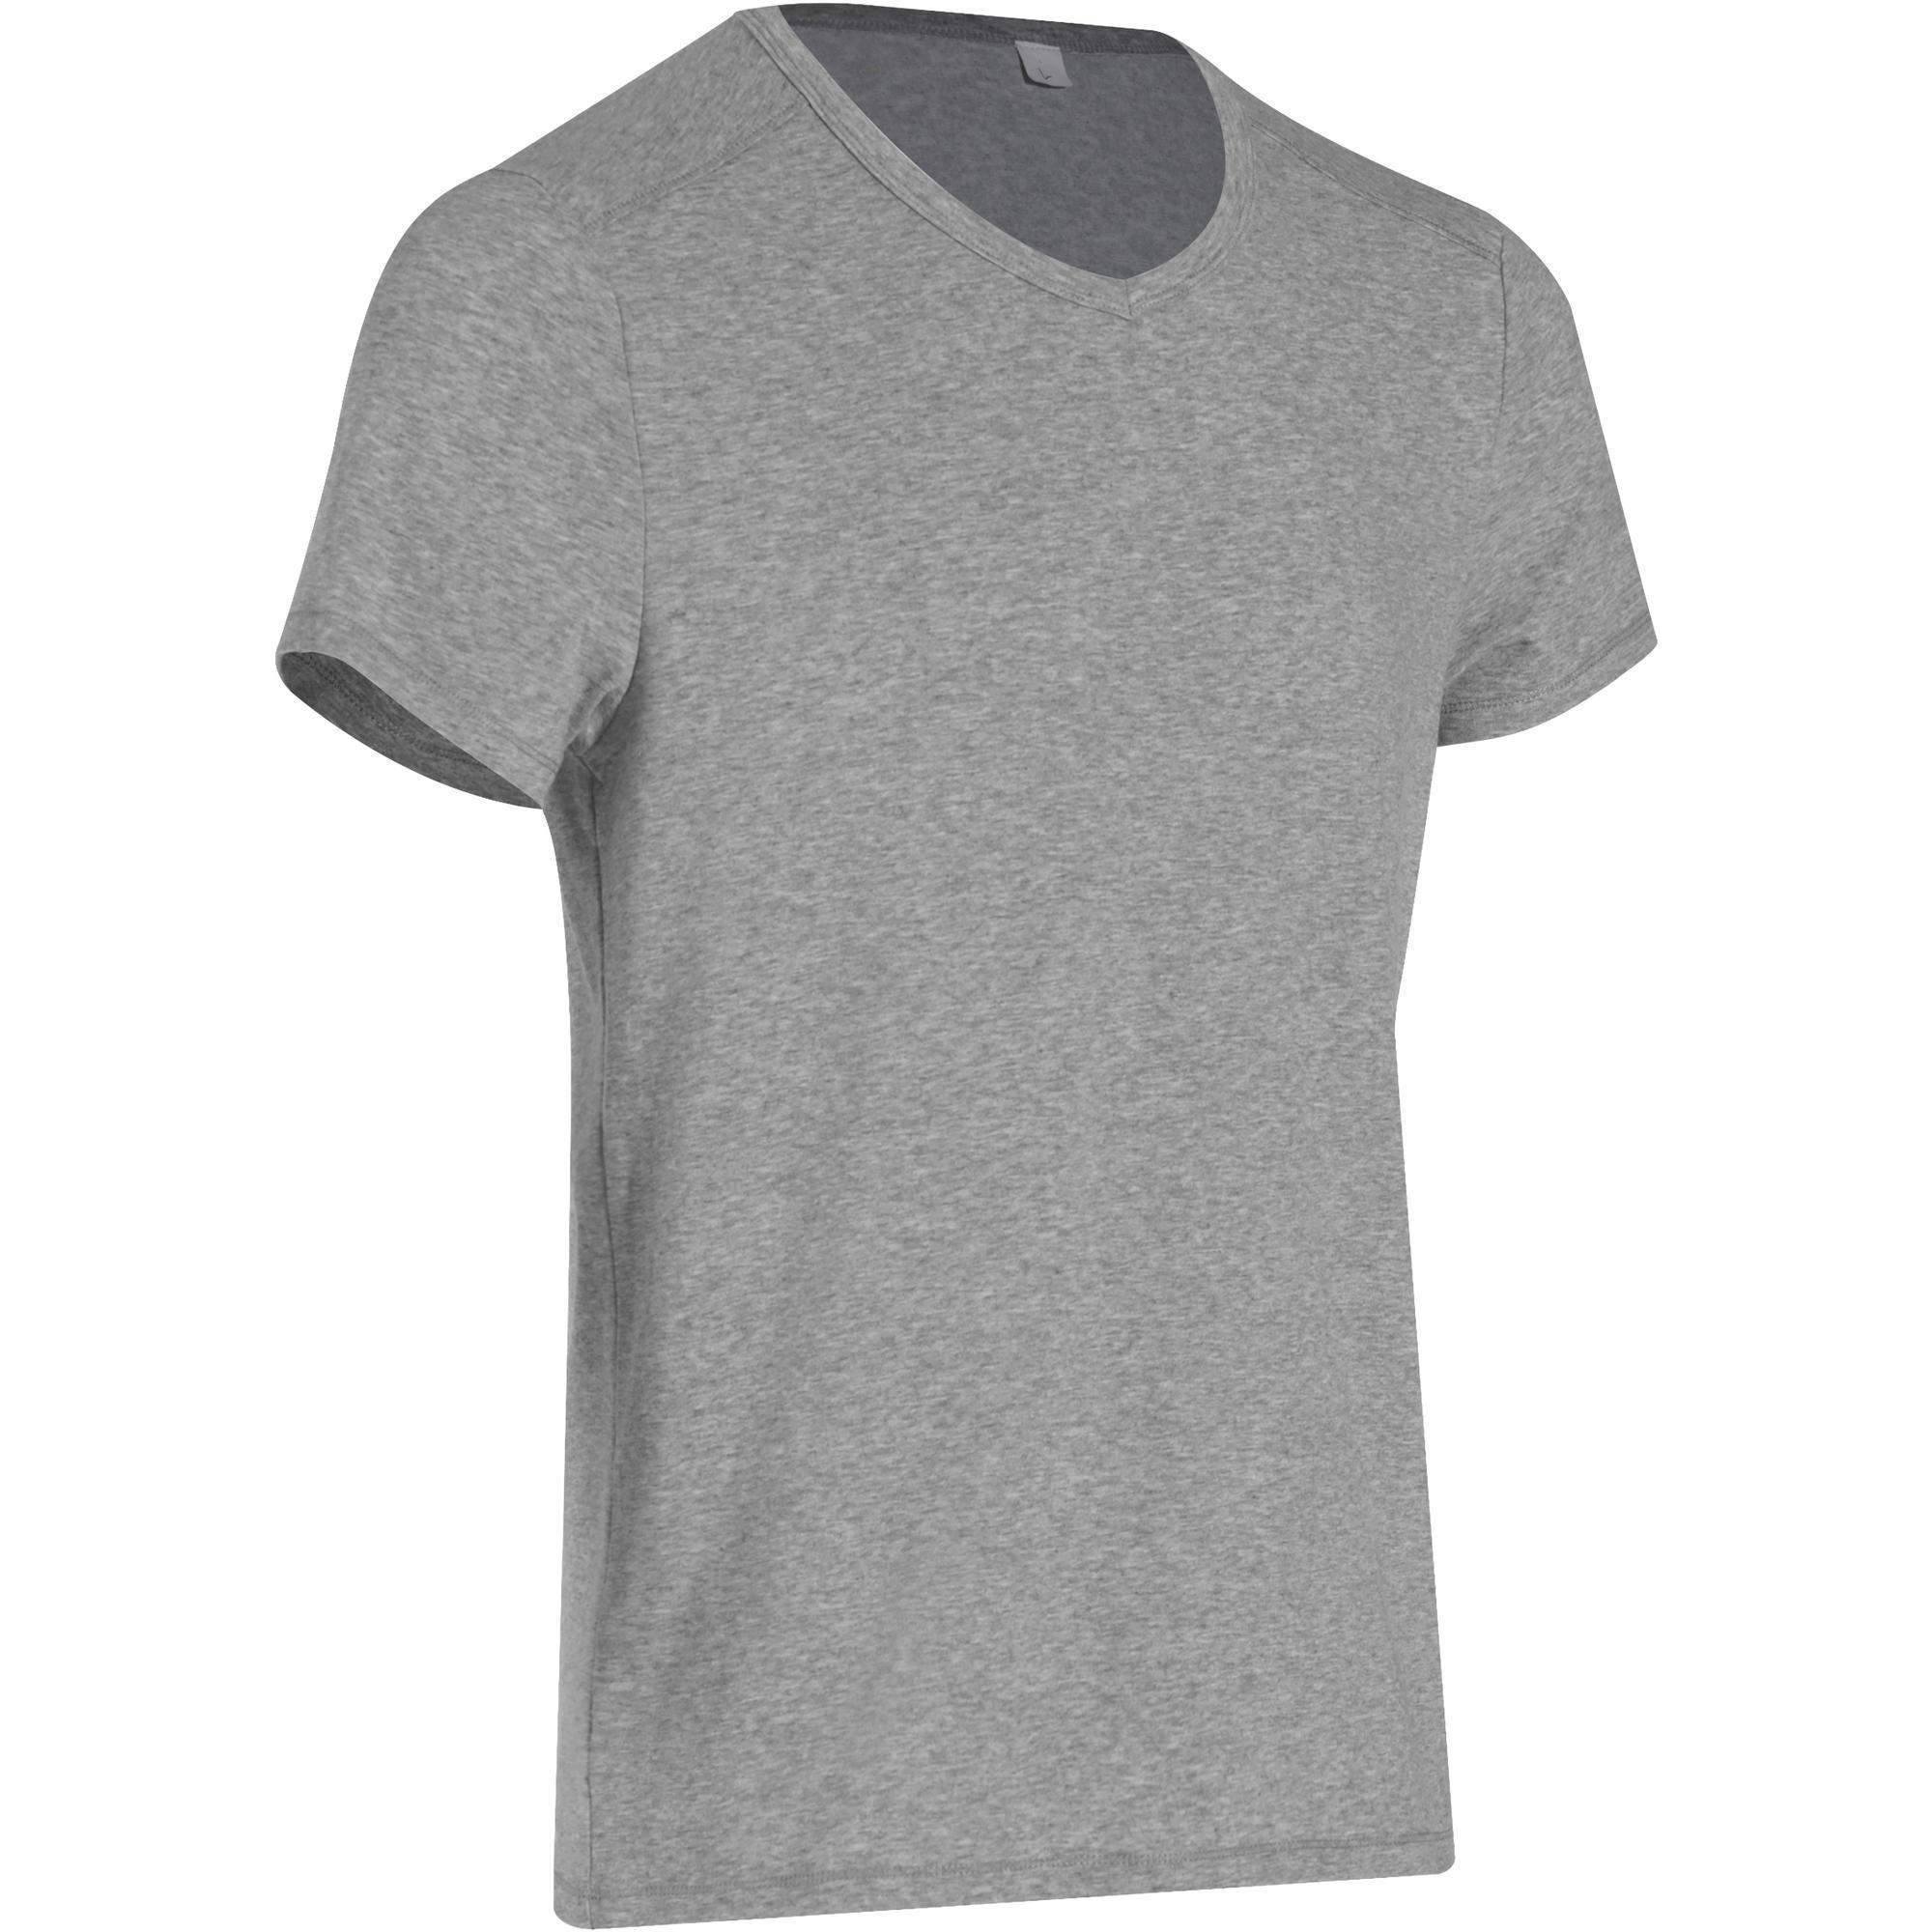 T shirt slim gym pilates homme gris domyos by decathlon - Petit trampoline decathlon ...